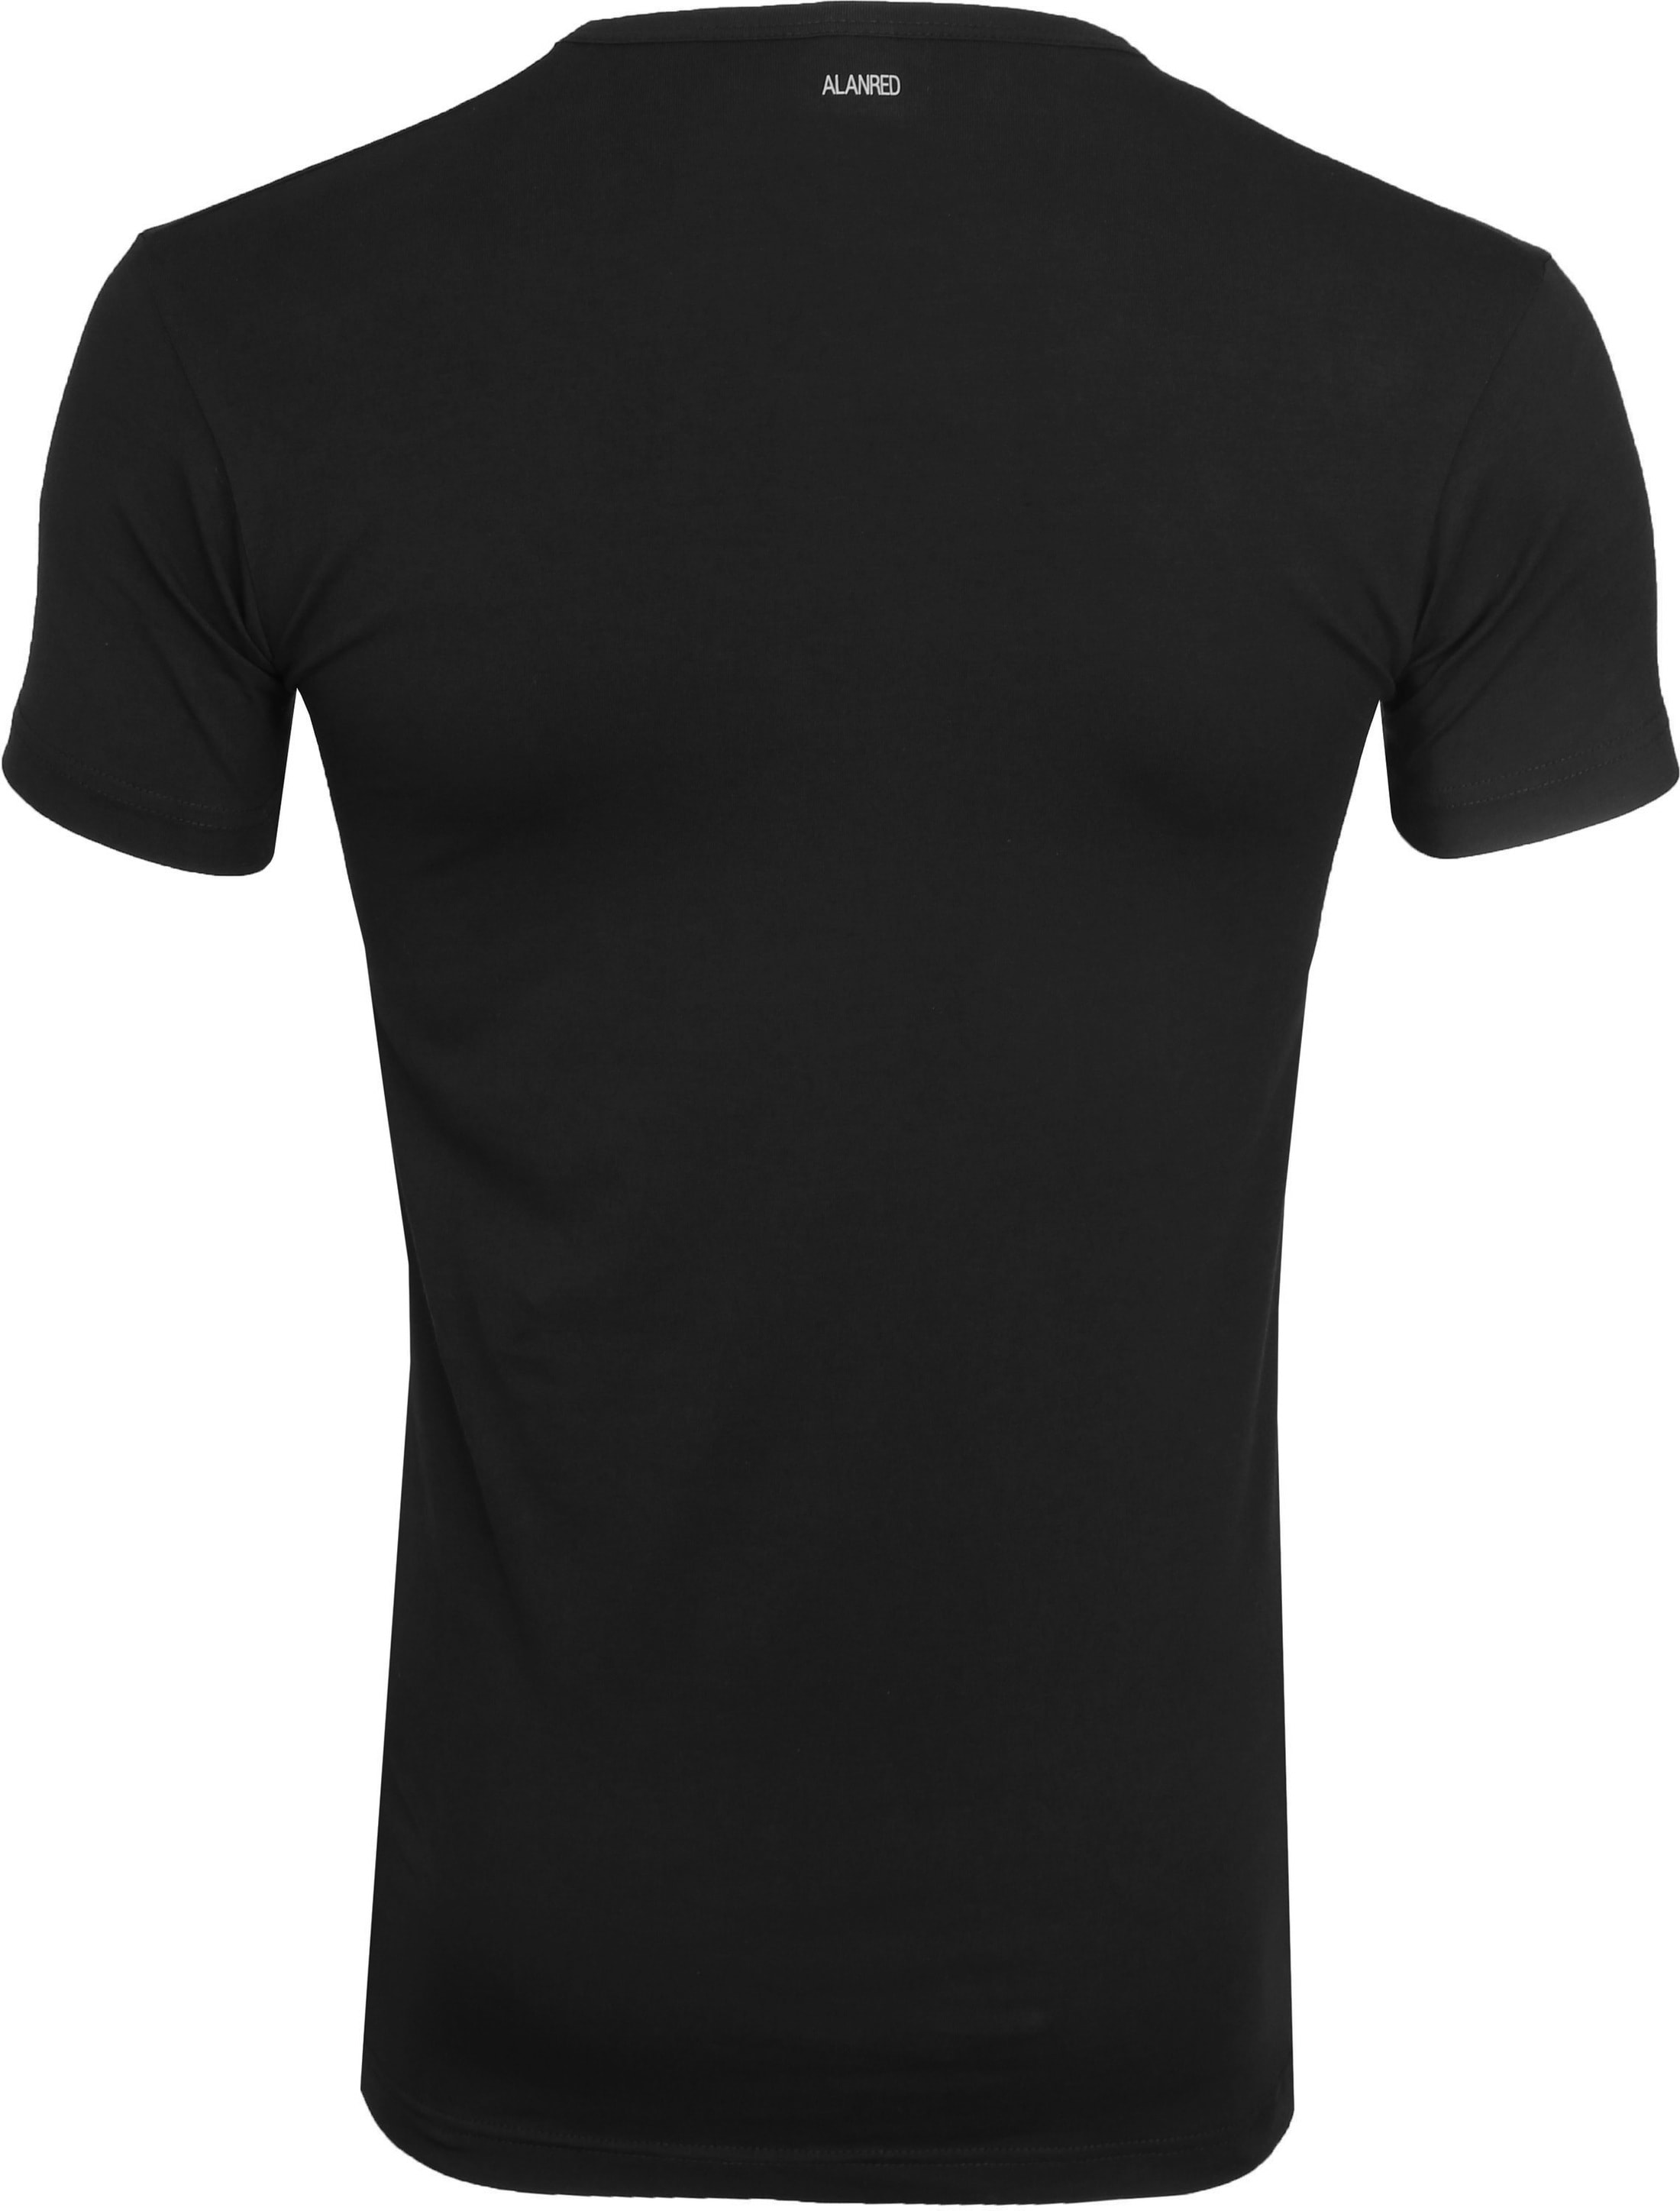 Alan Red Oklahoma Stretch T-Shirt Schwarz (2er-Pack) Foto 4